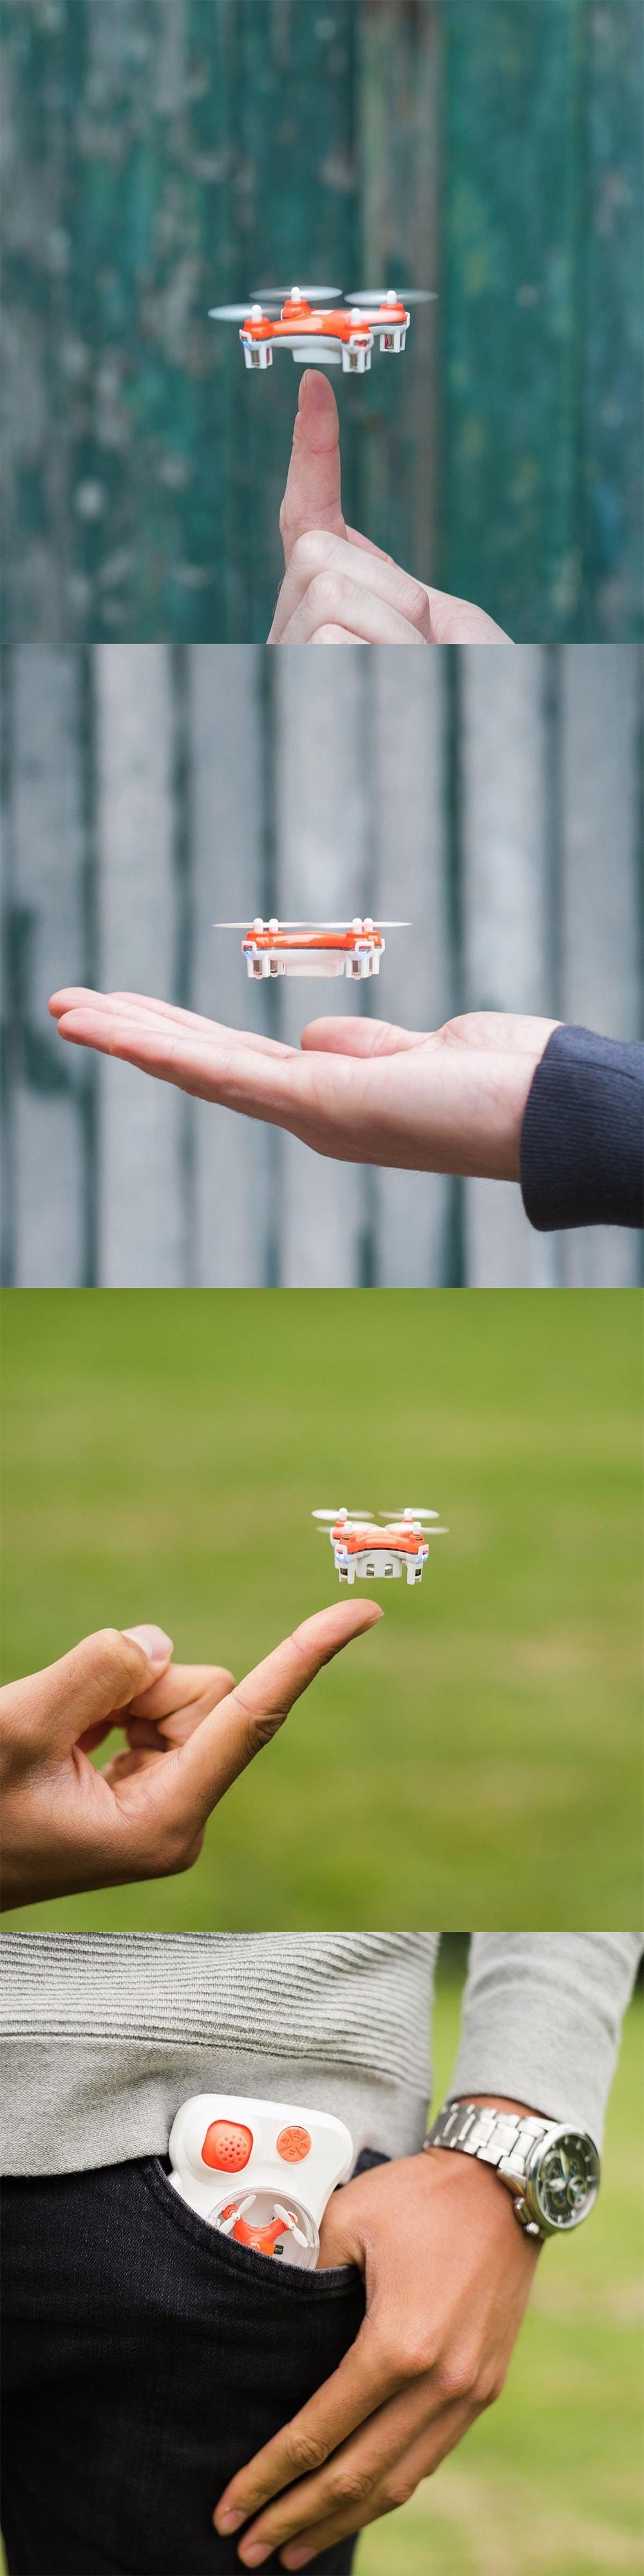 Mini Pocket Drone The Smallest Drone in The World